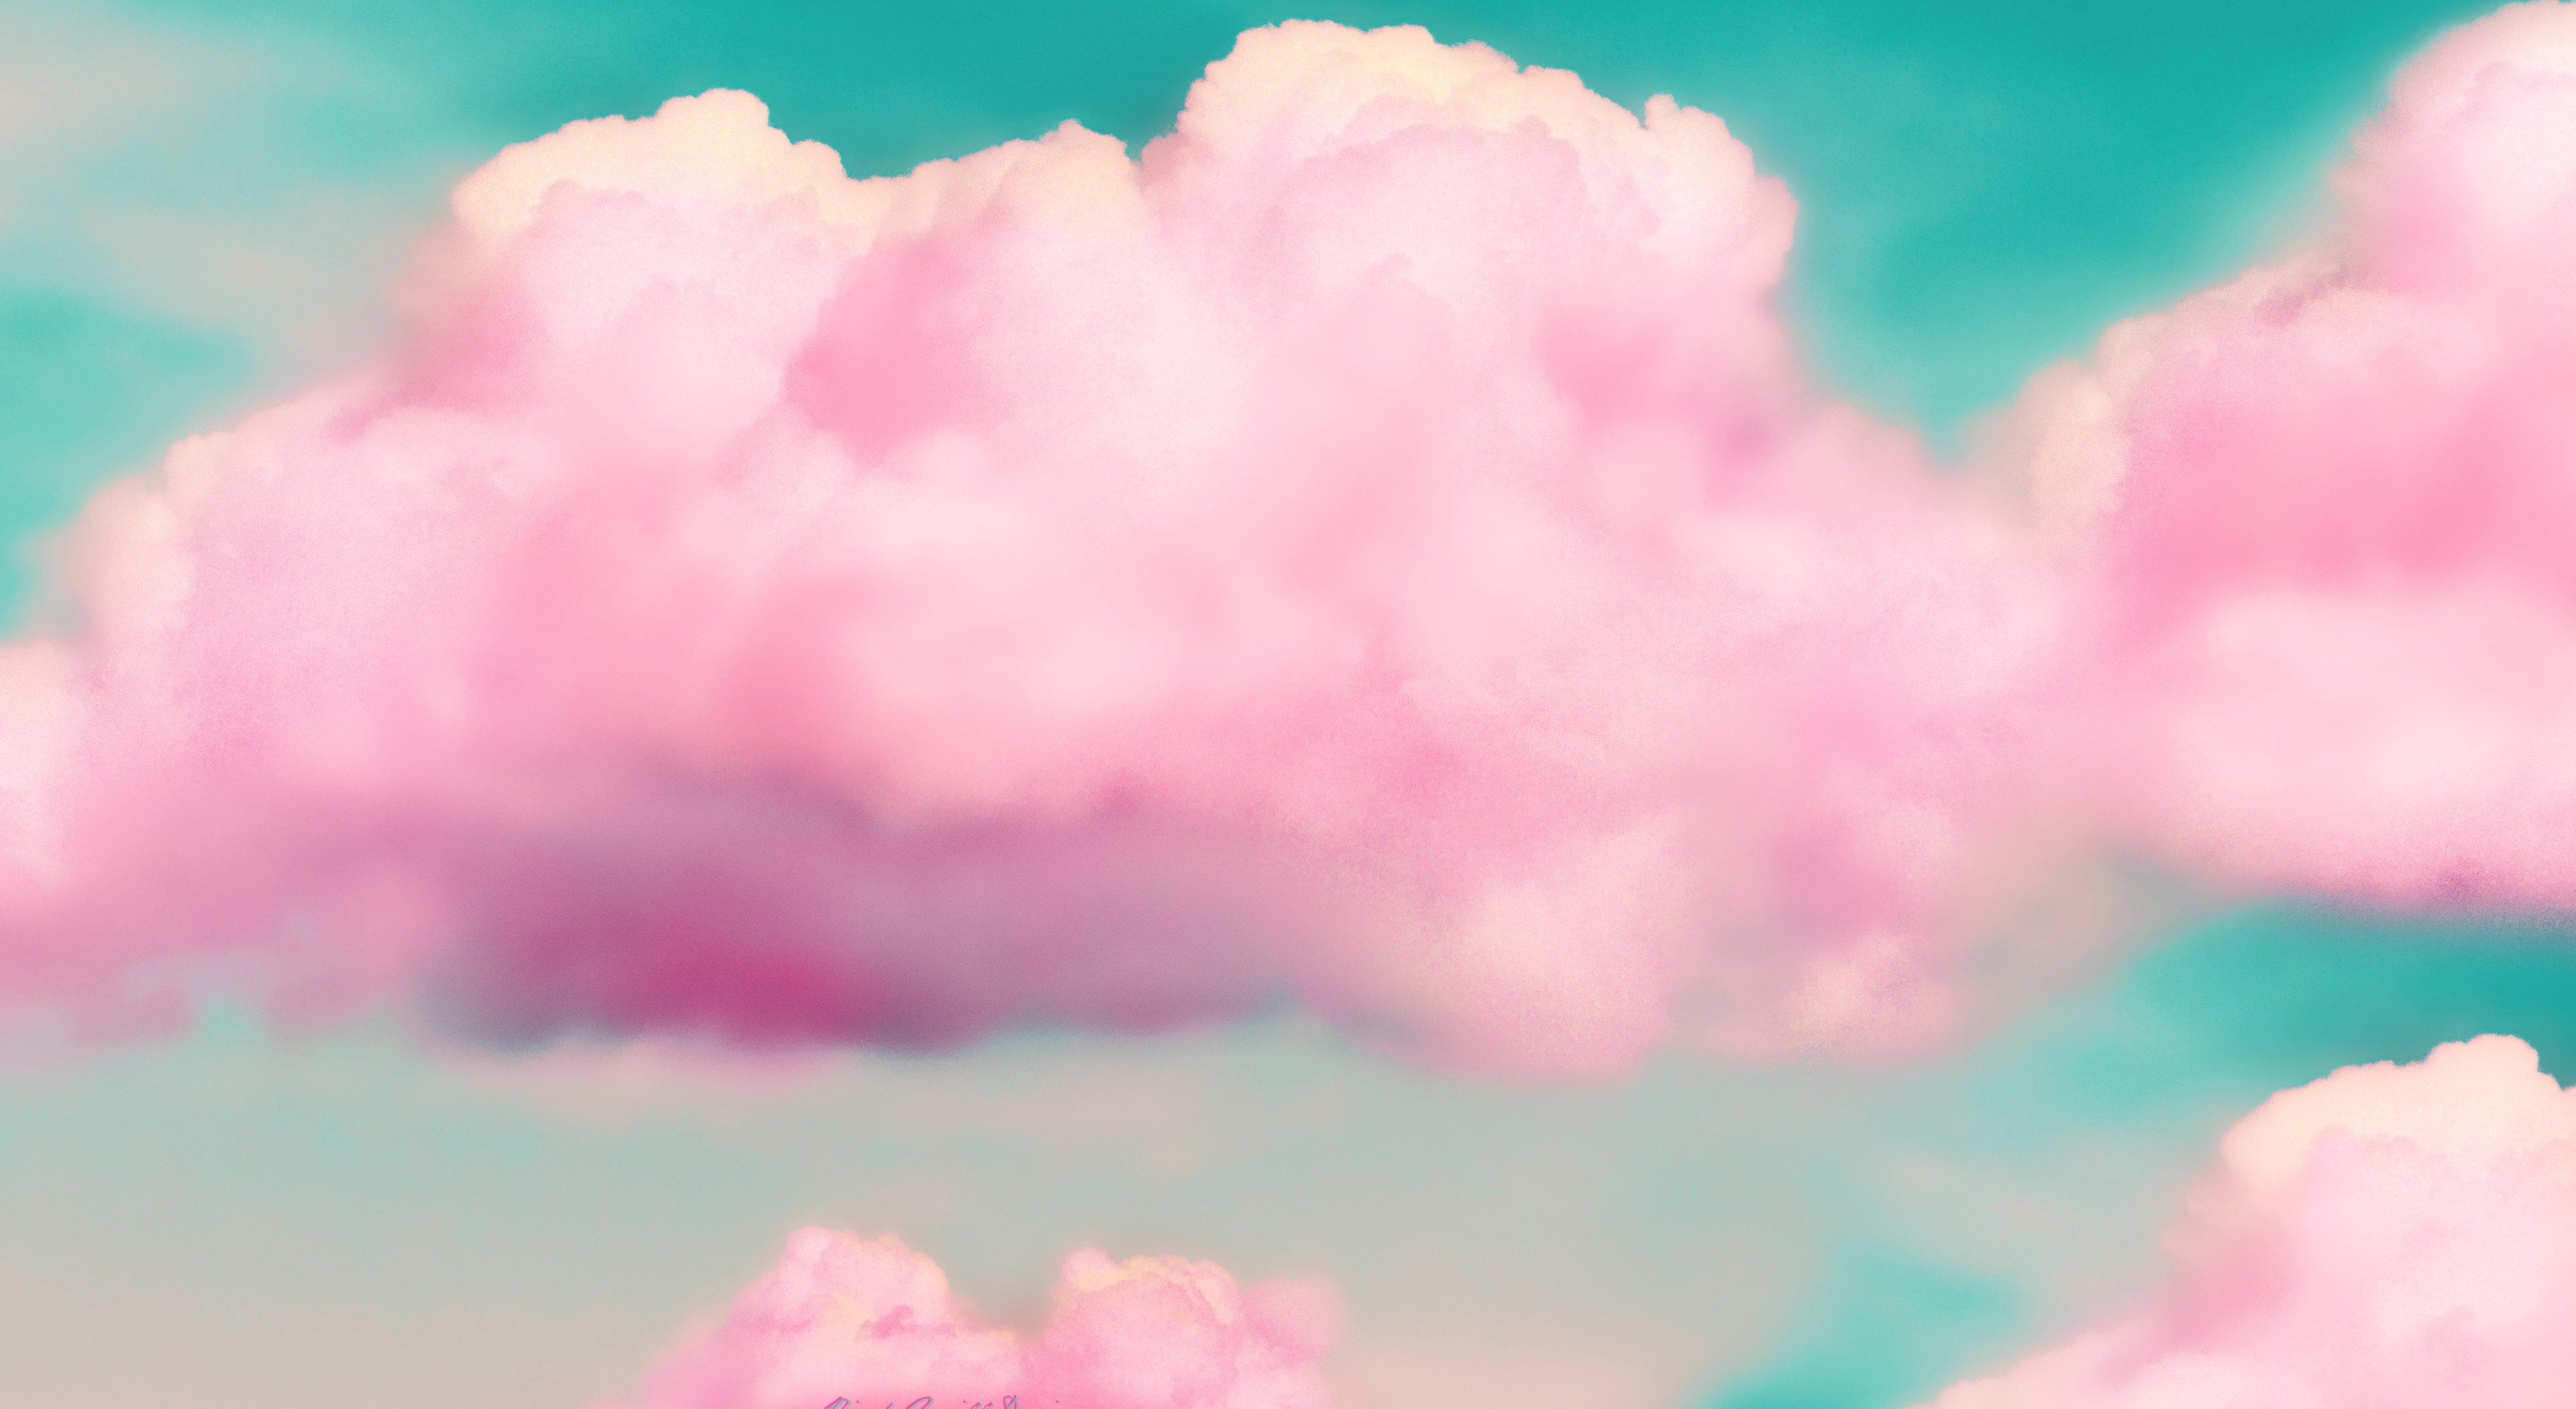 Pink clouds 3d hd artist 4k wallpapers images - Pink wallpaper 4k ...